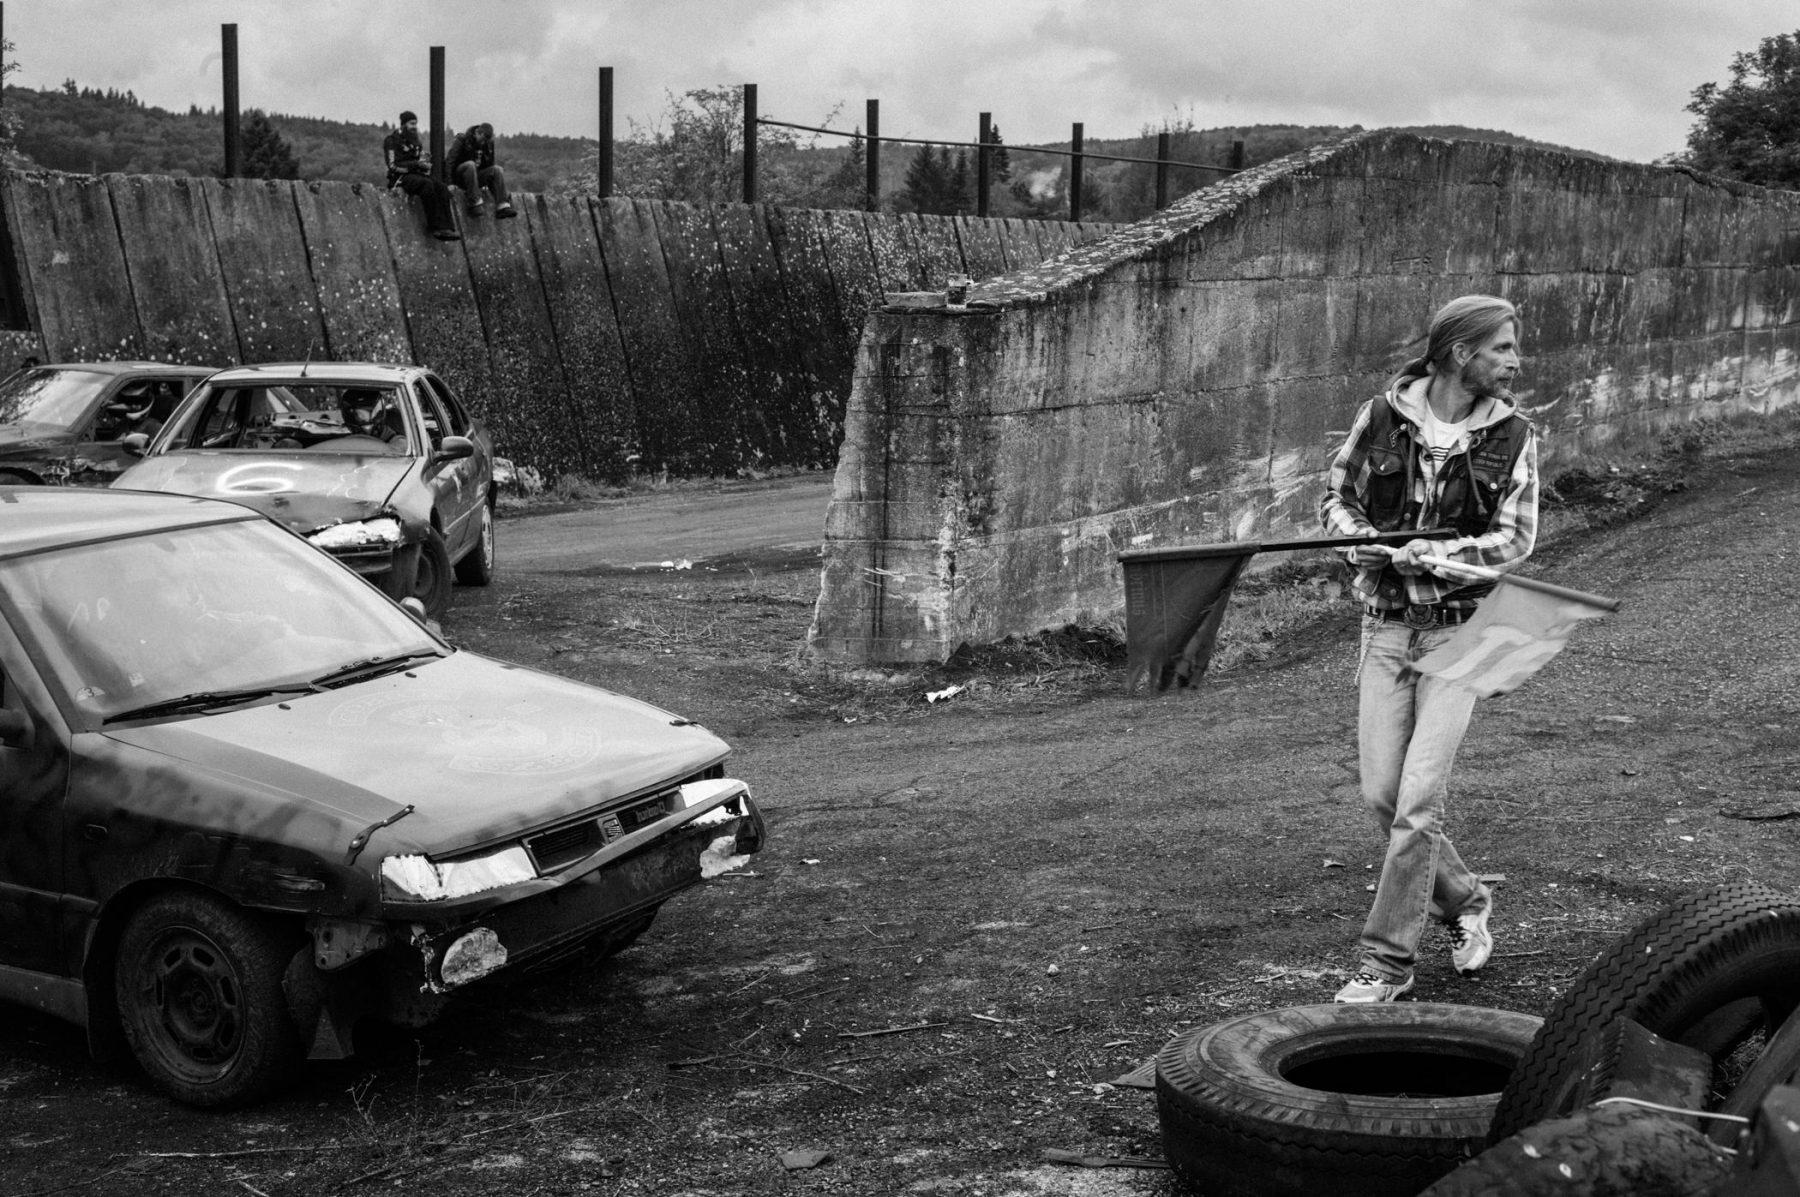 kevin_v_ton_Crash-Cars_07